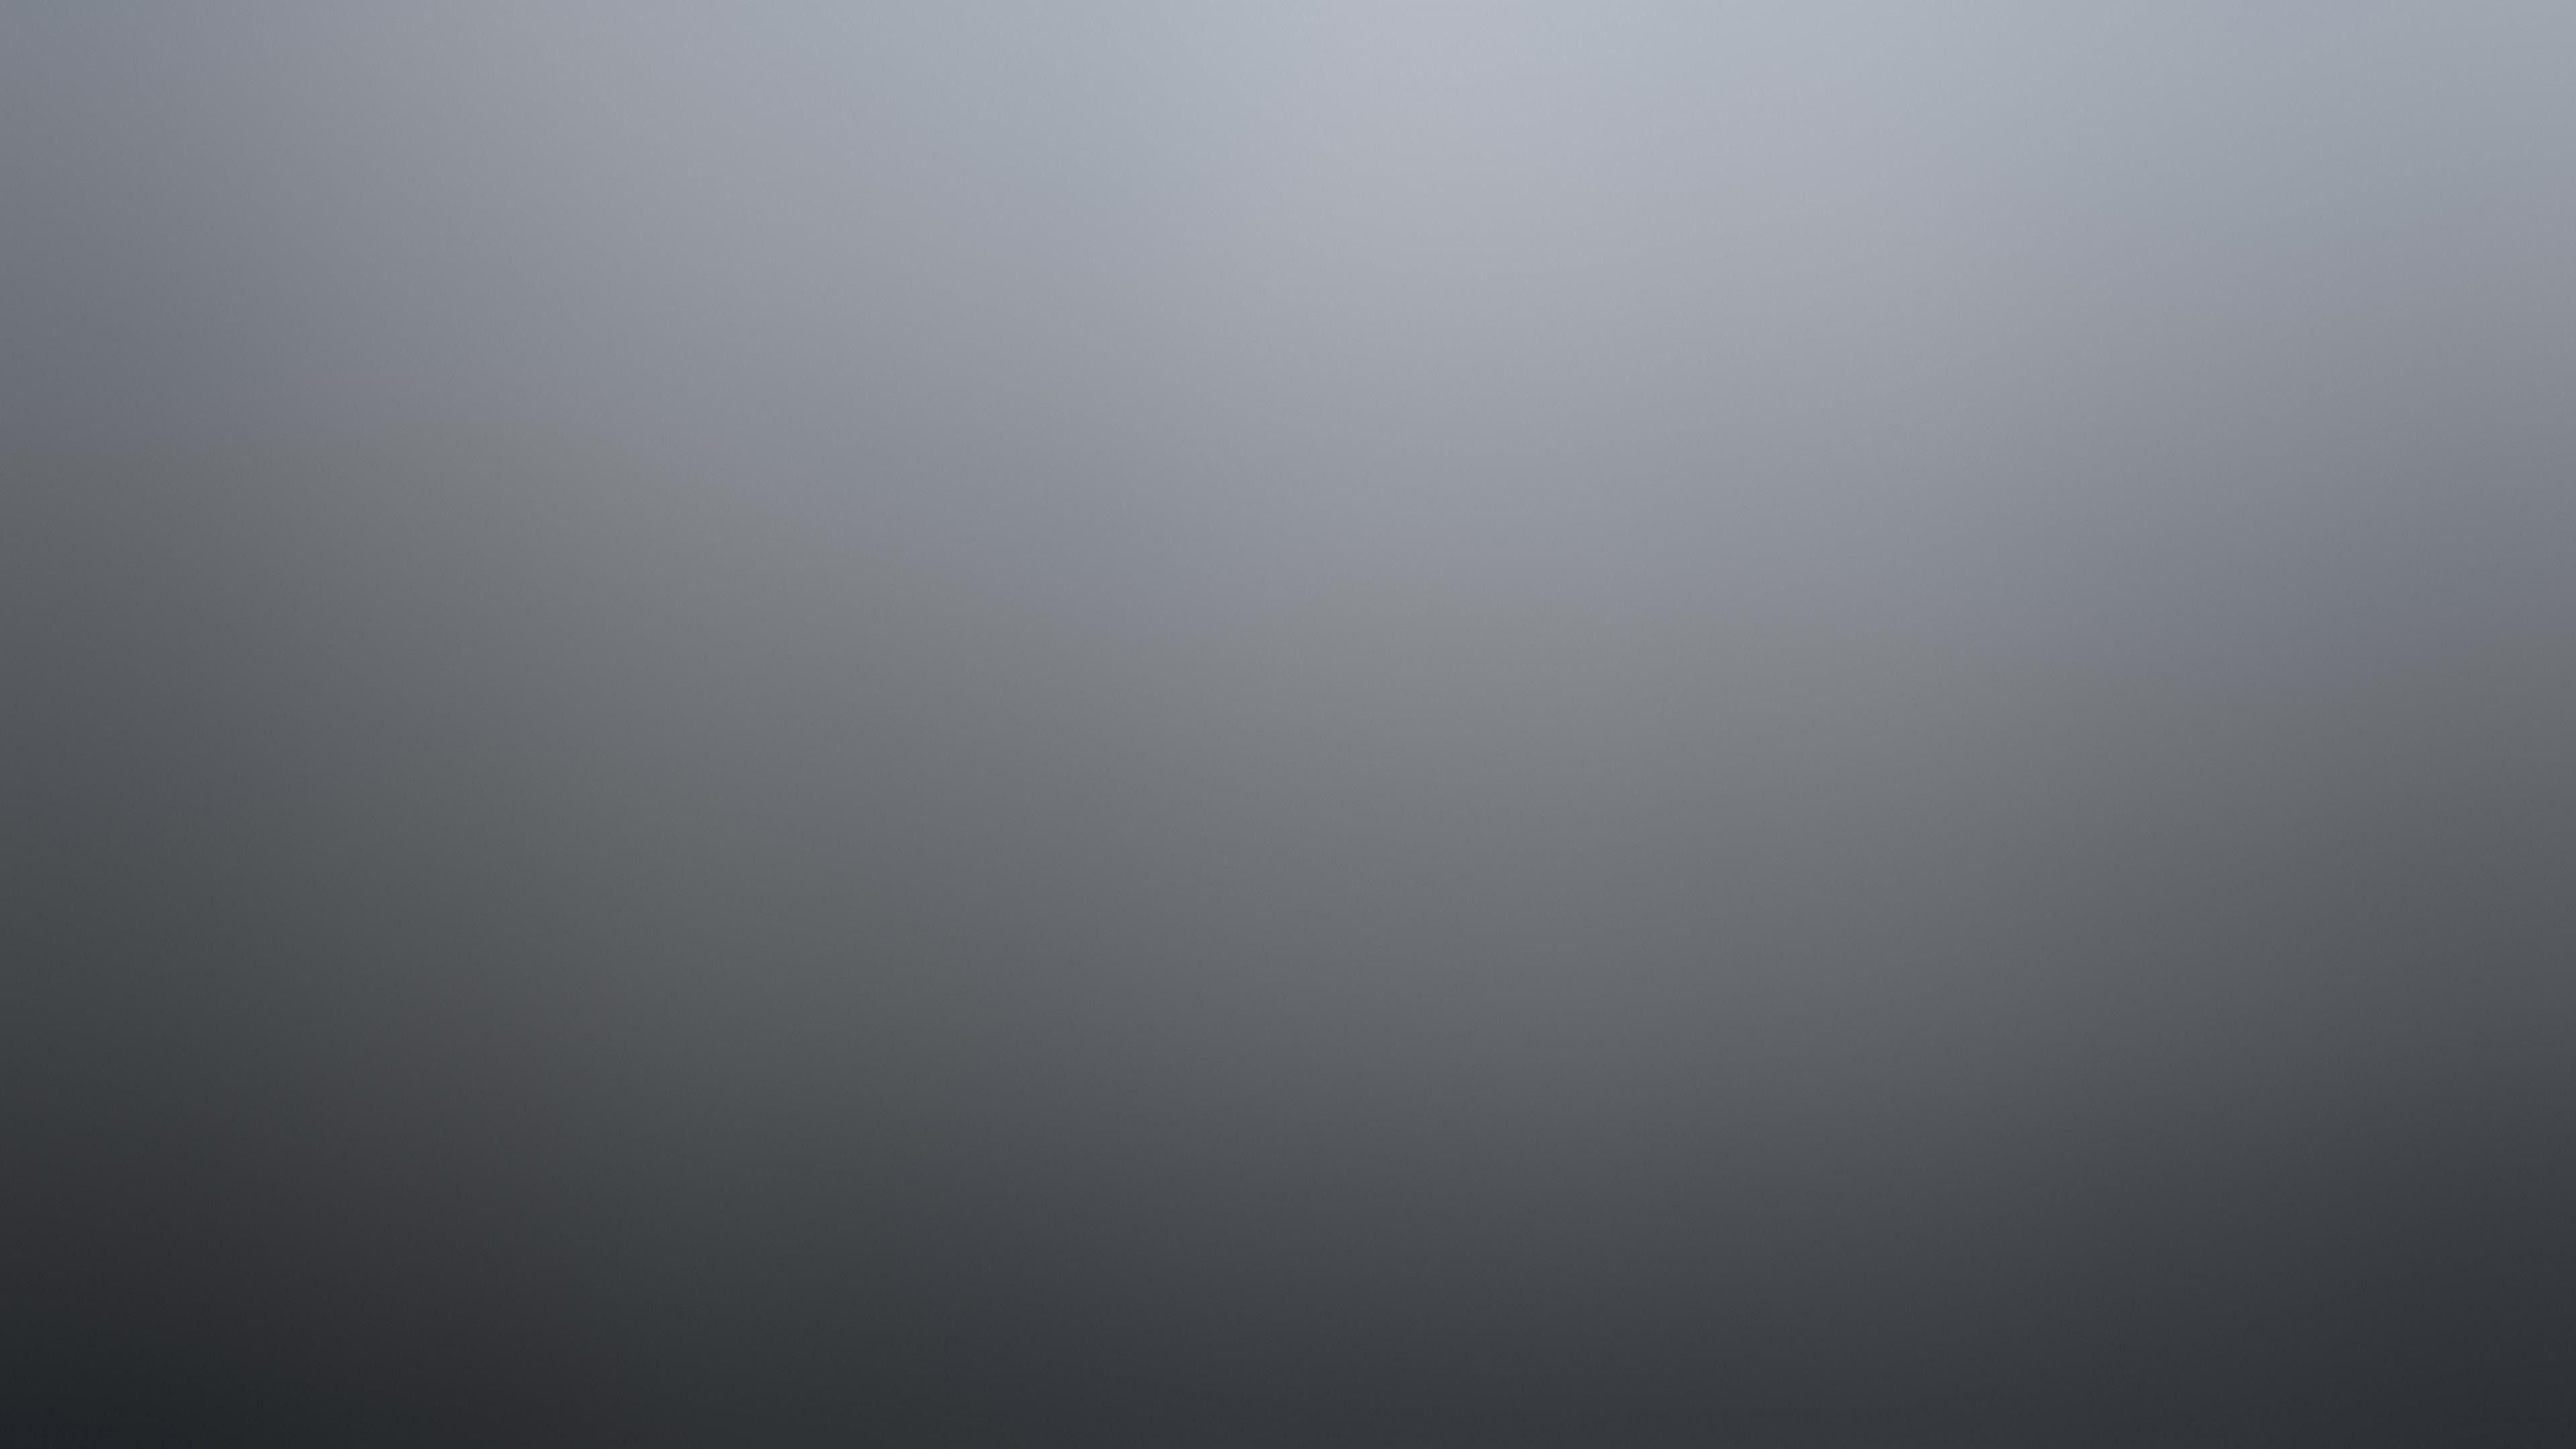 download 3840x2160 gray black - photo #13